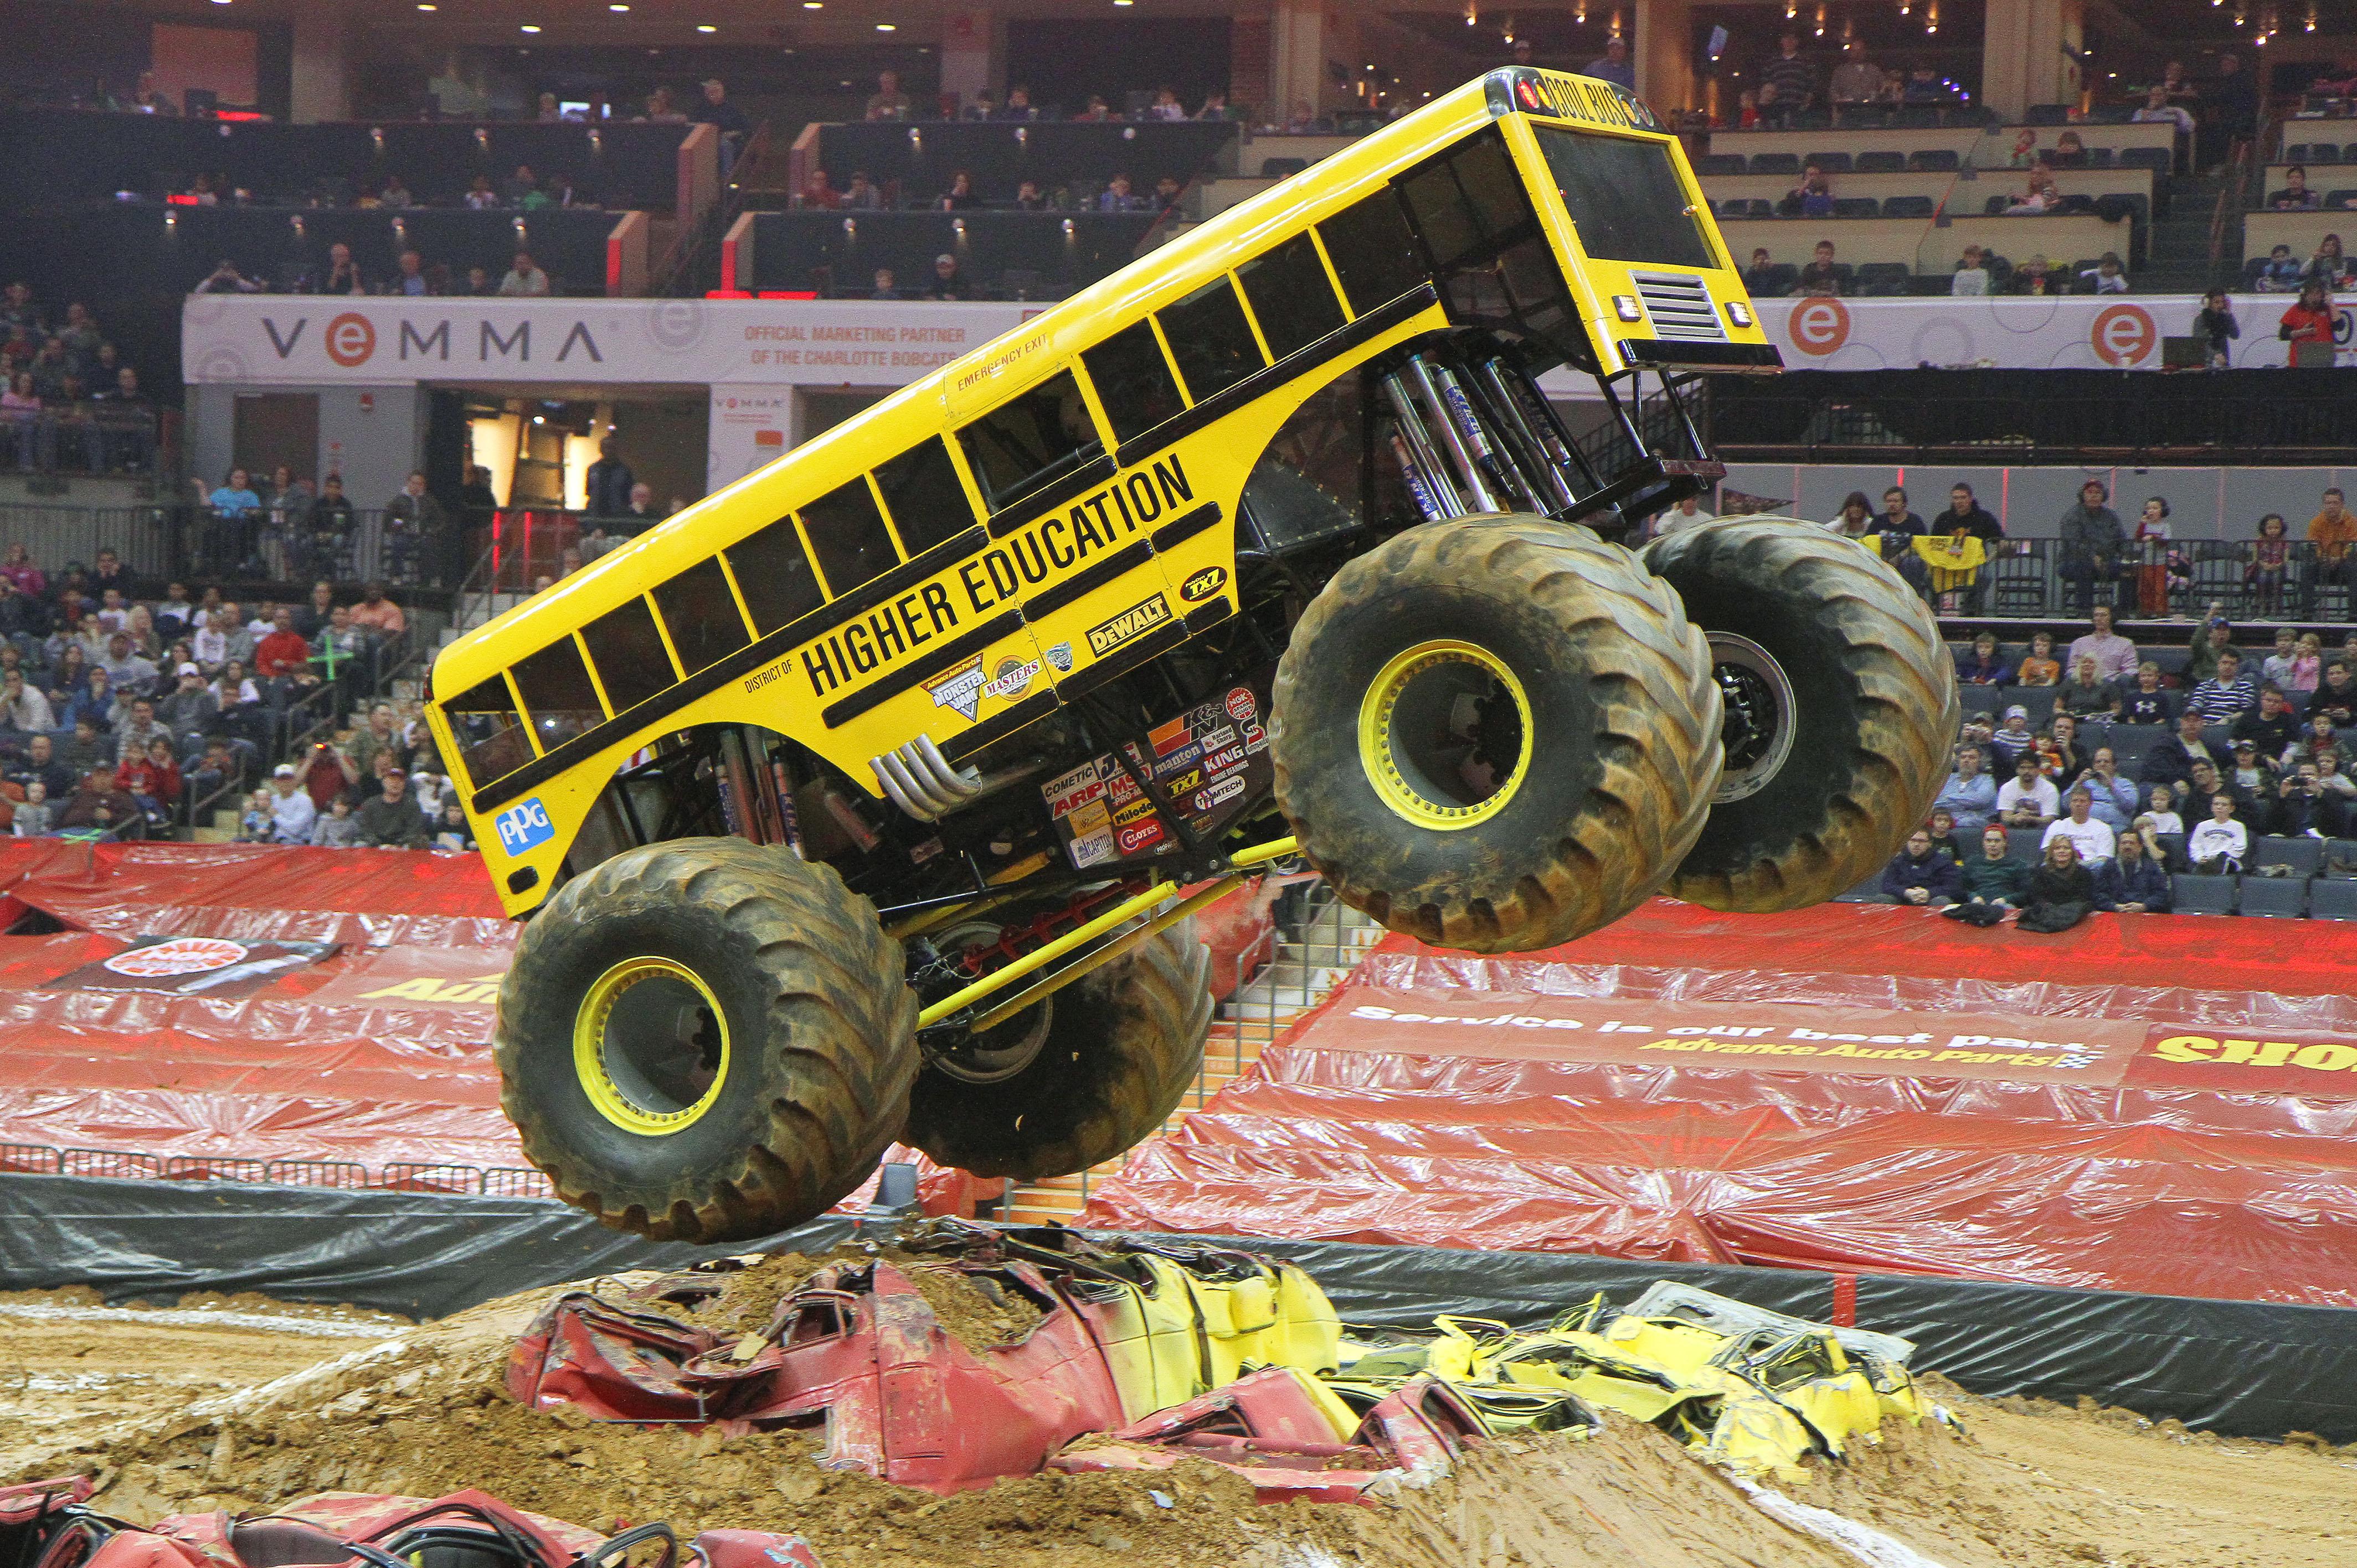 Monster Truck Games - Play Monster Truck Games on Free ...